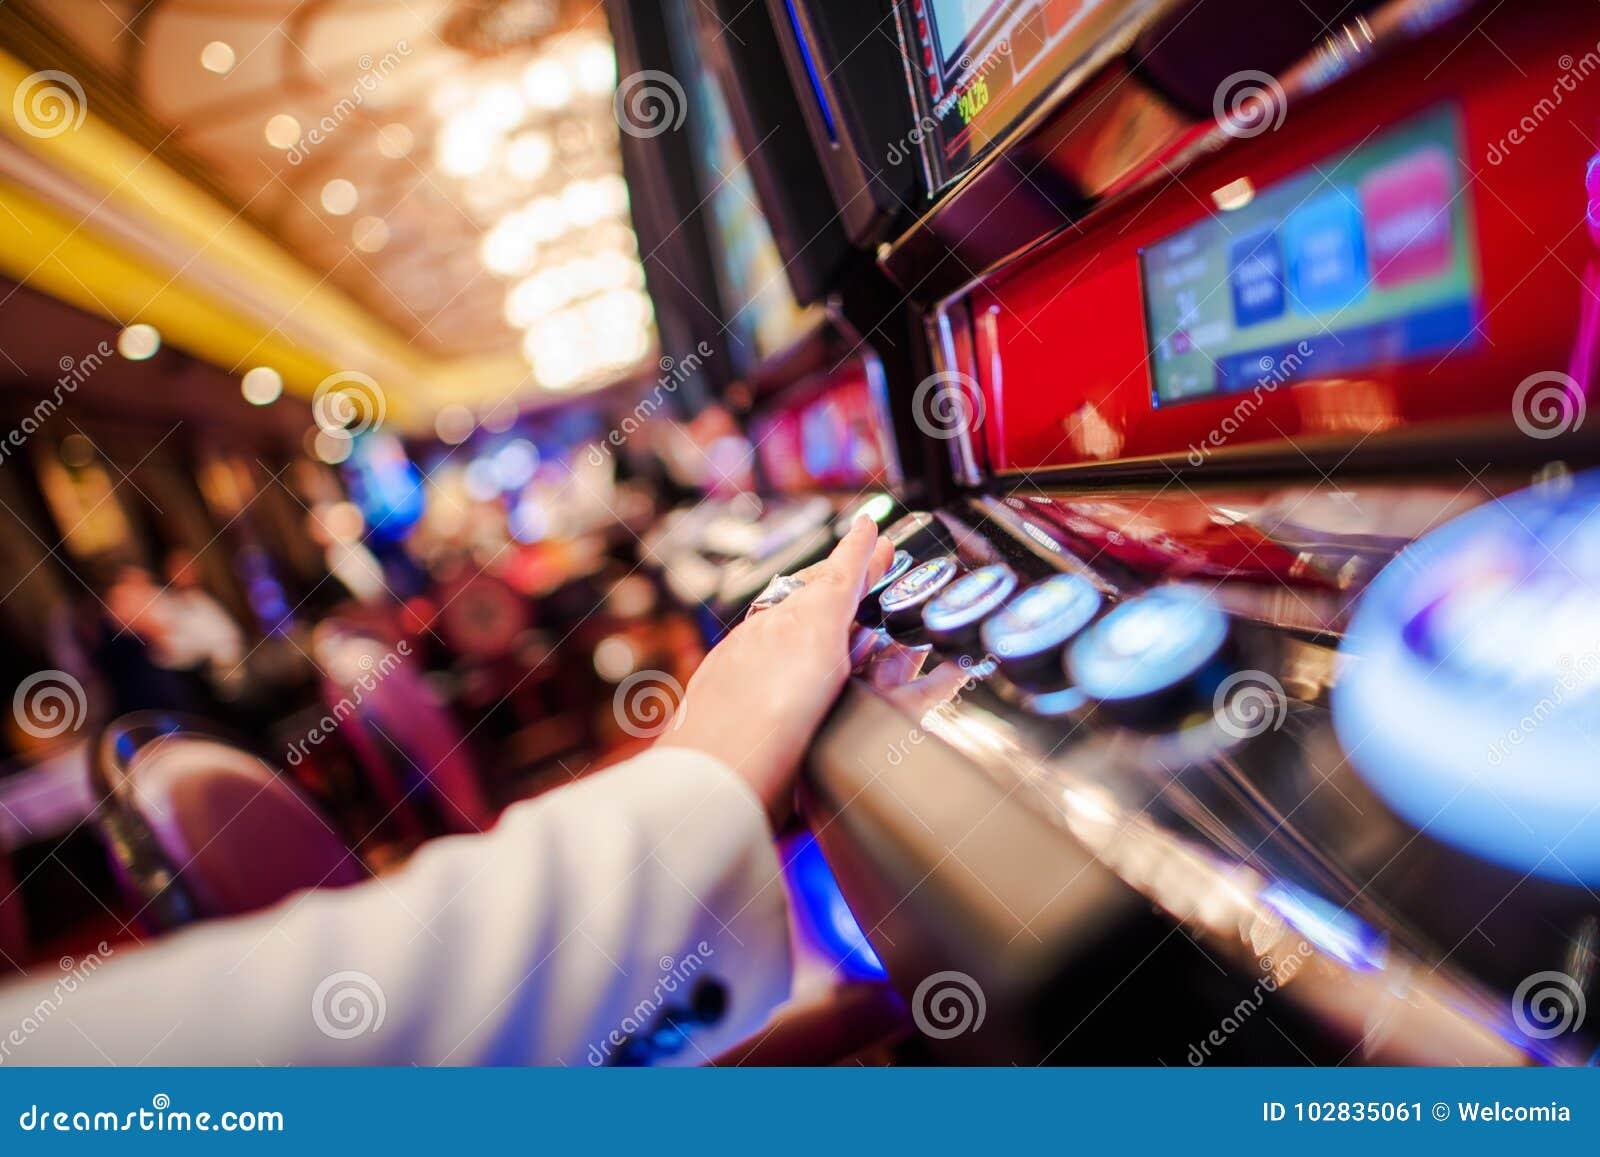 Casino Slot Video Games Stock Image Image Of Bandit 102835061